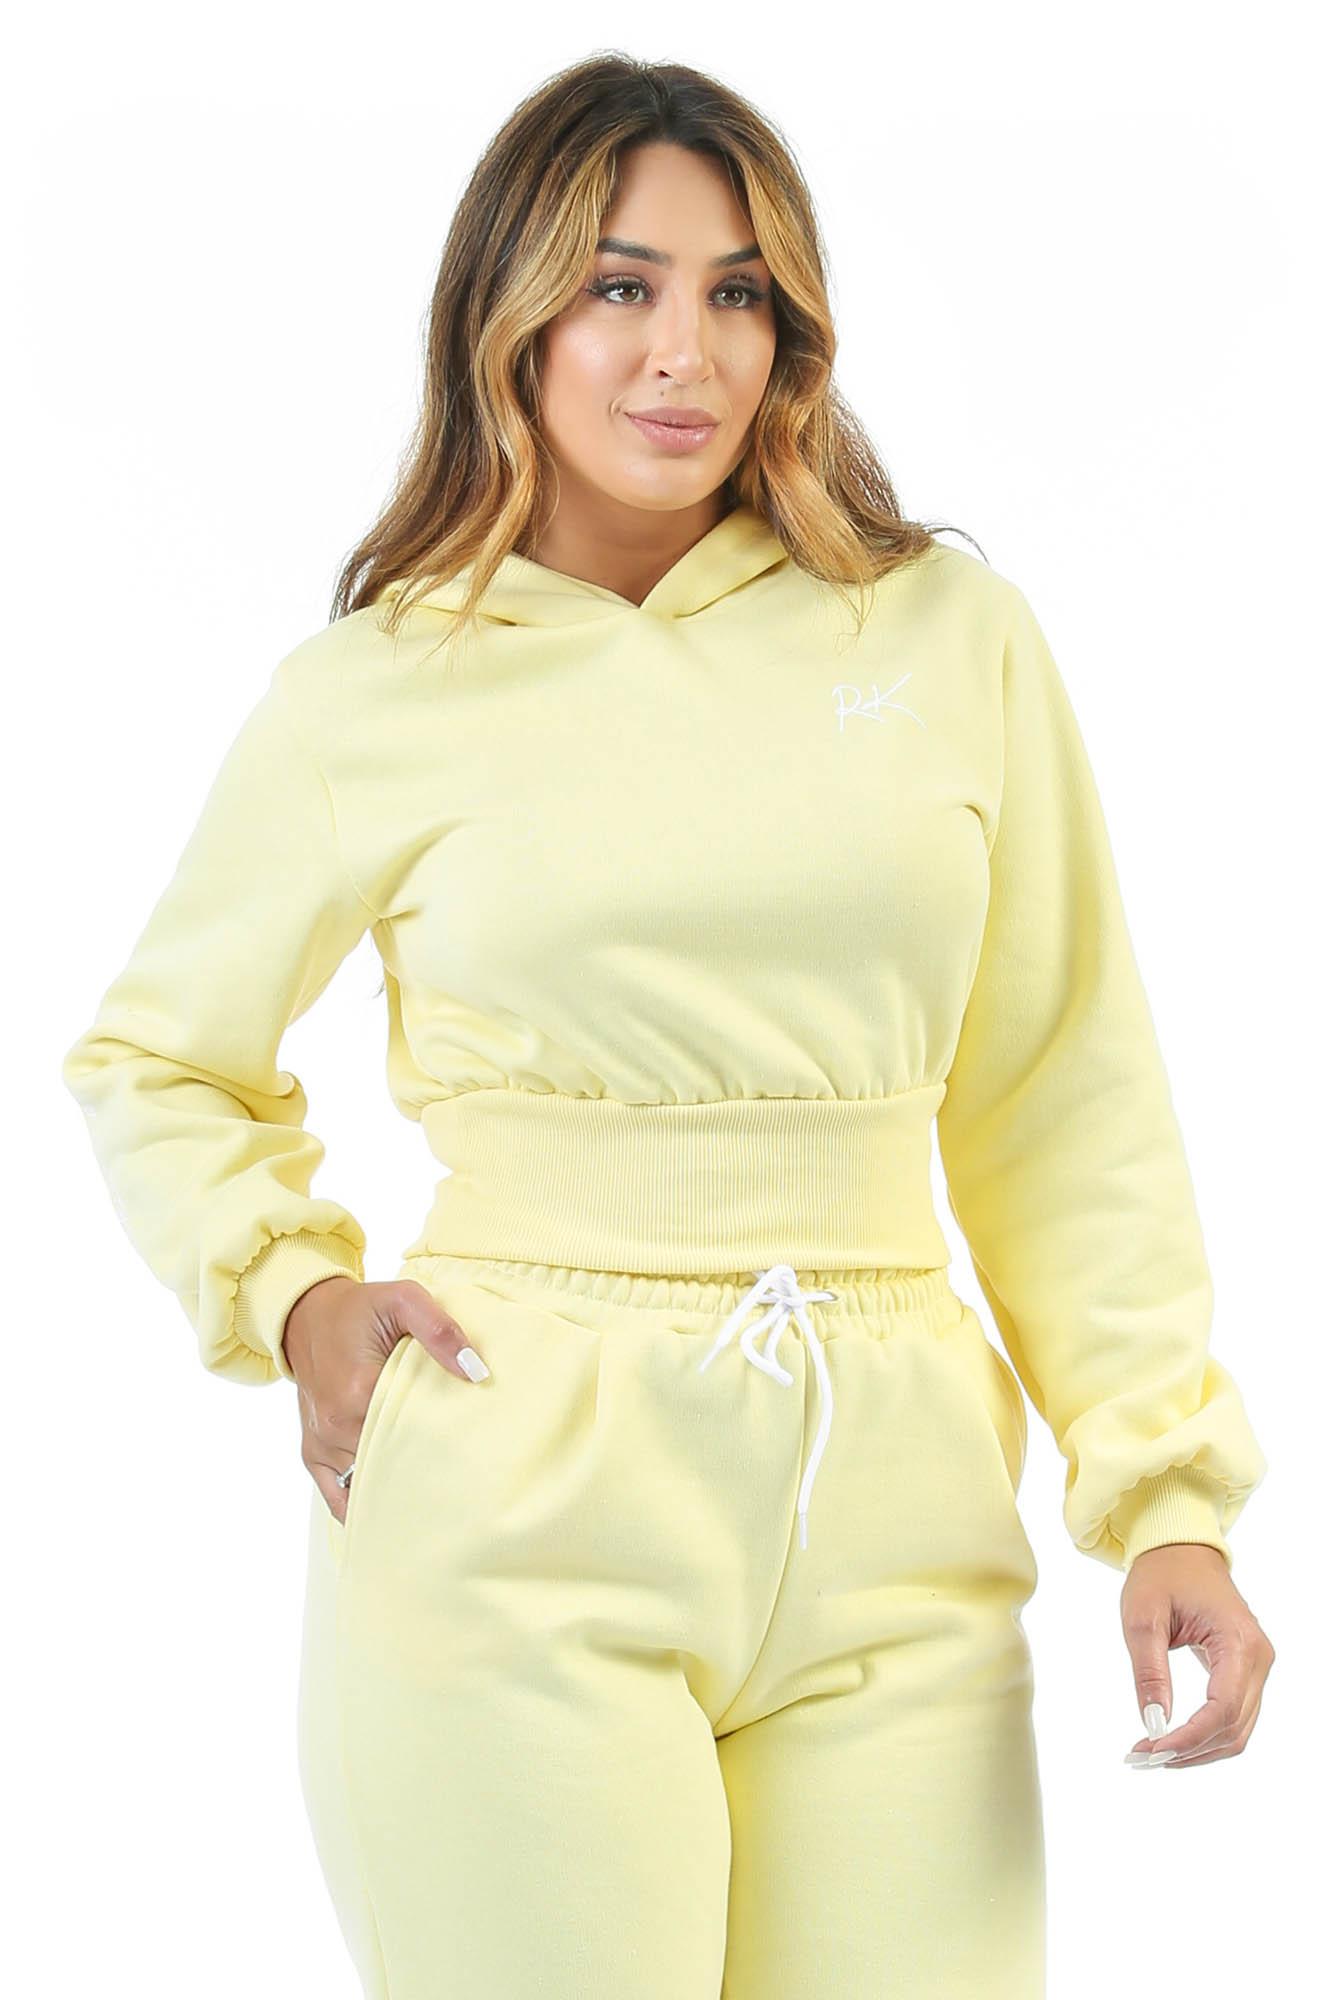 Blusa Moletom Baddie Baby Amarelo